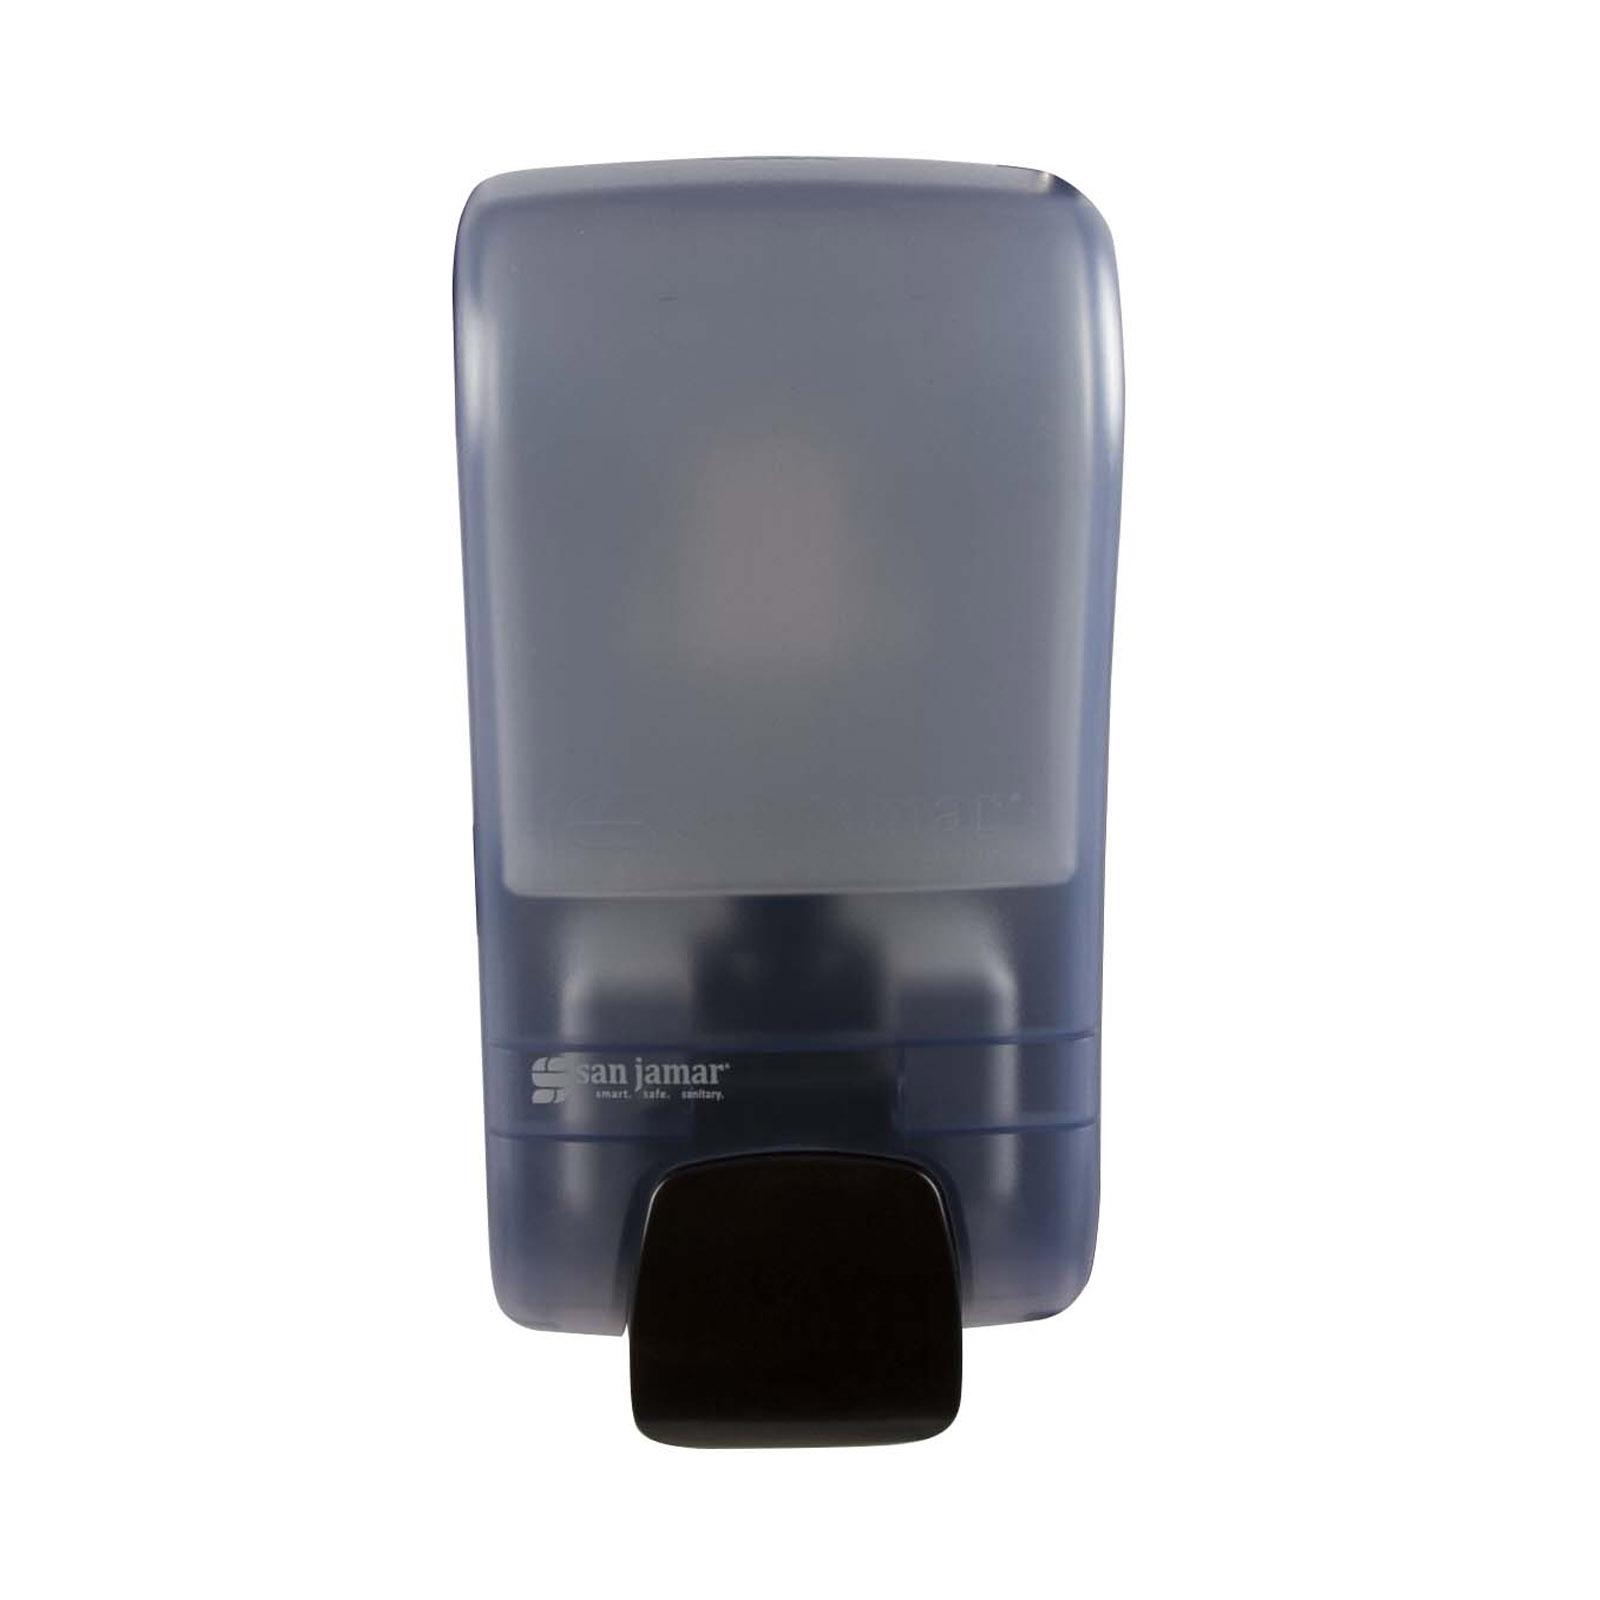 San Jamar SF1300TBL hand soap / sanitizer dispenser